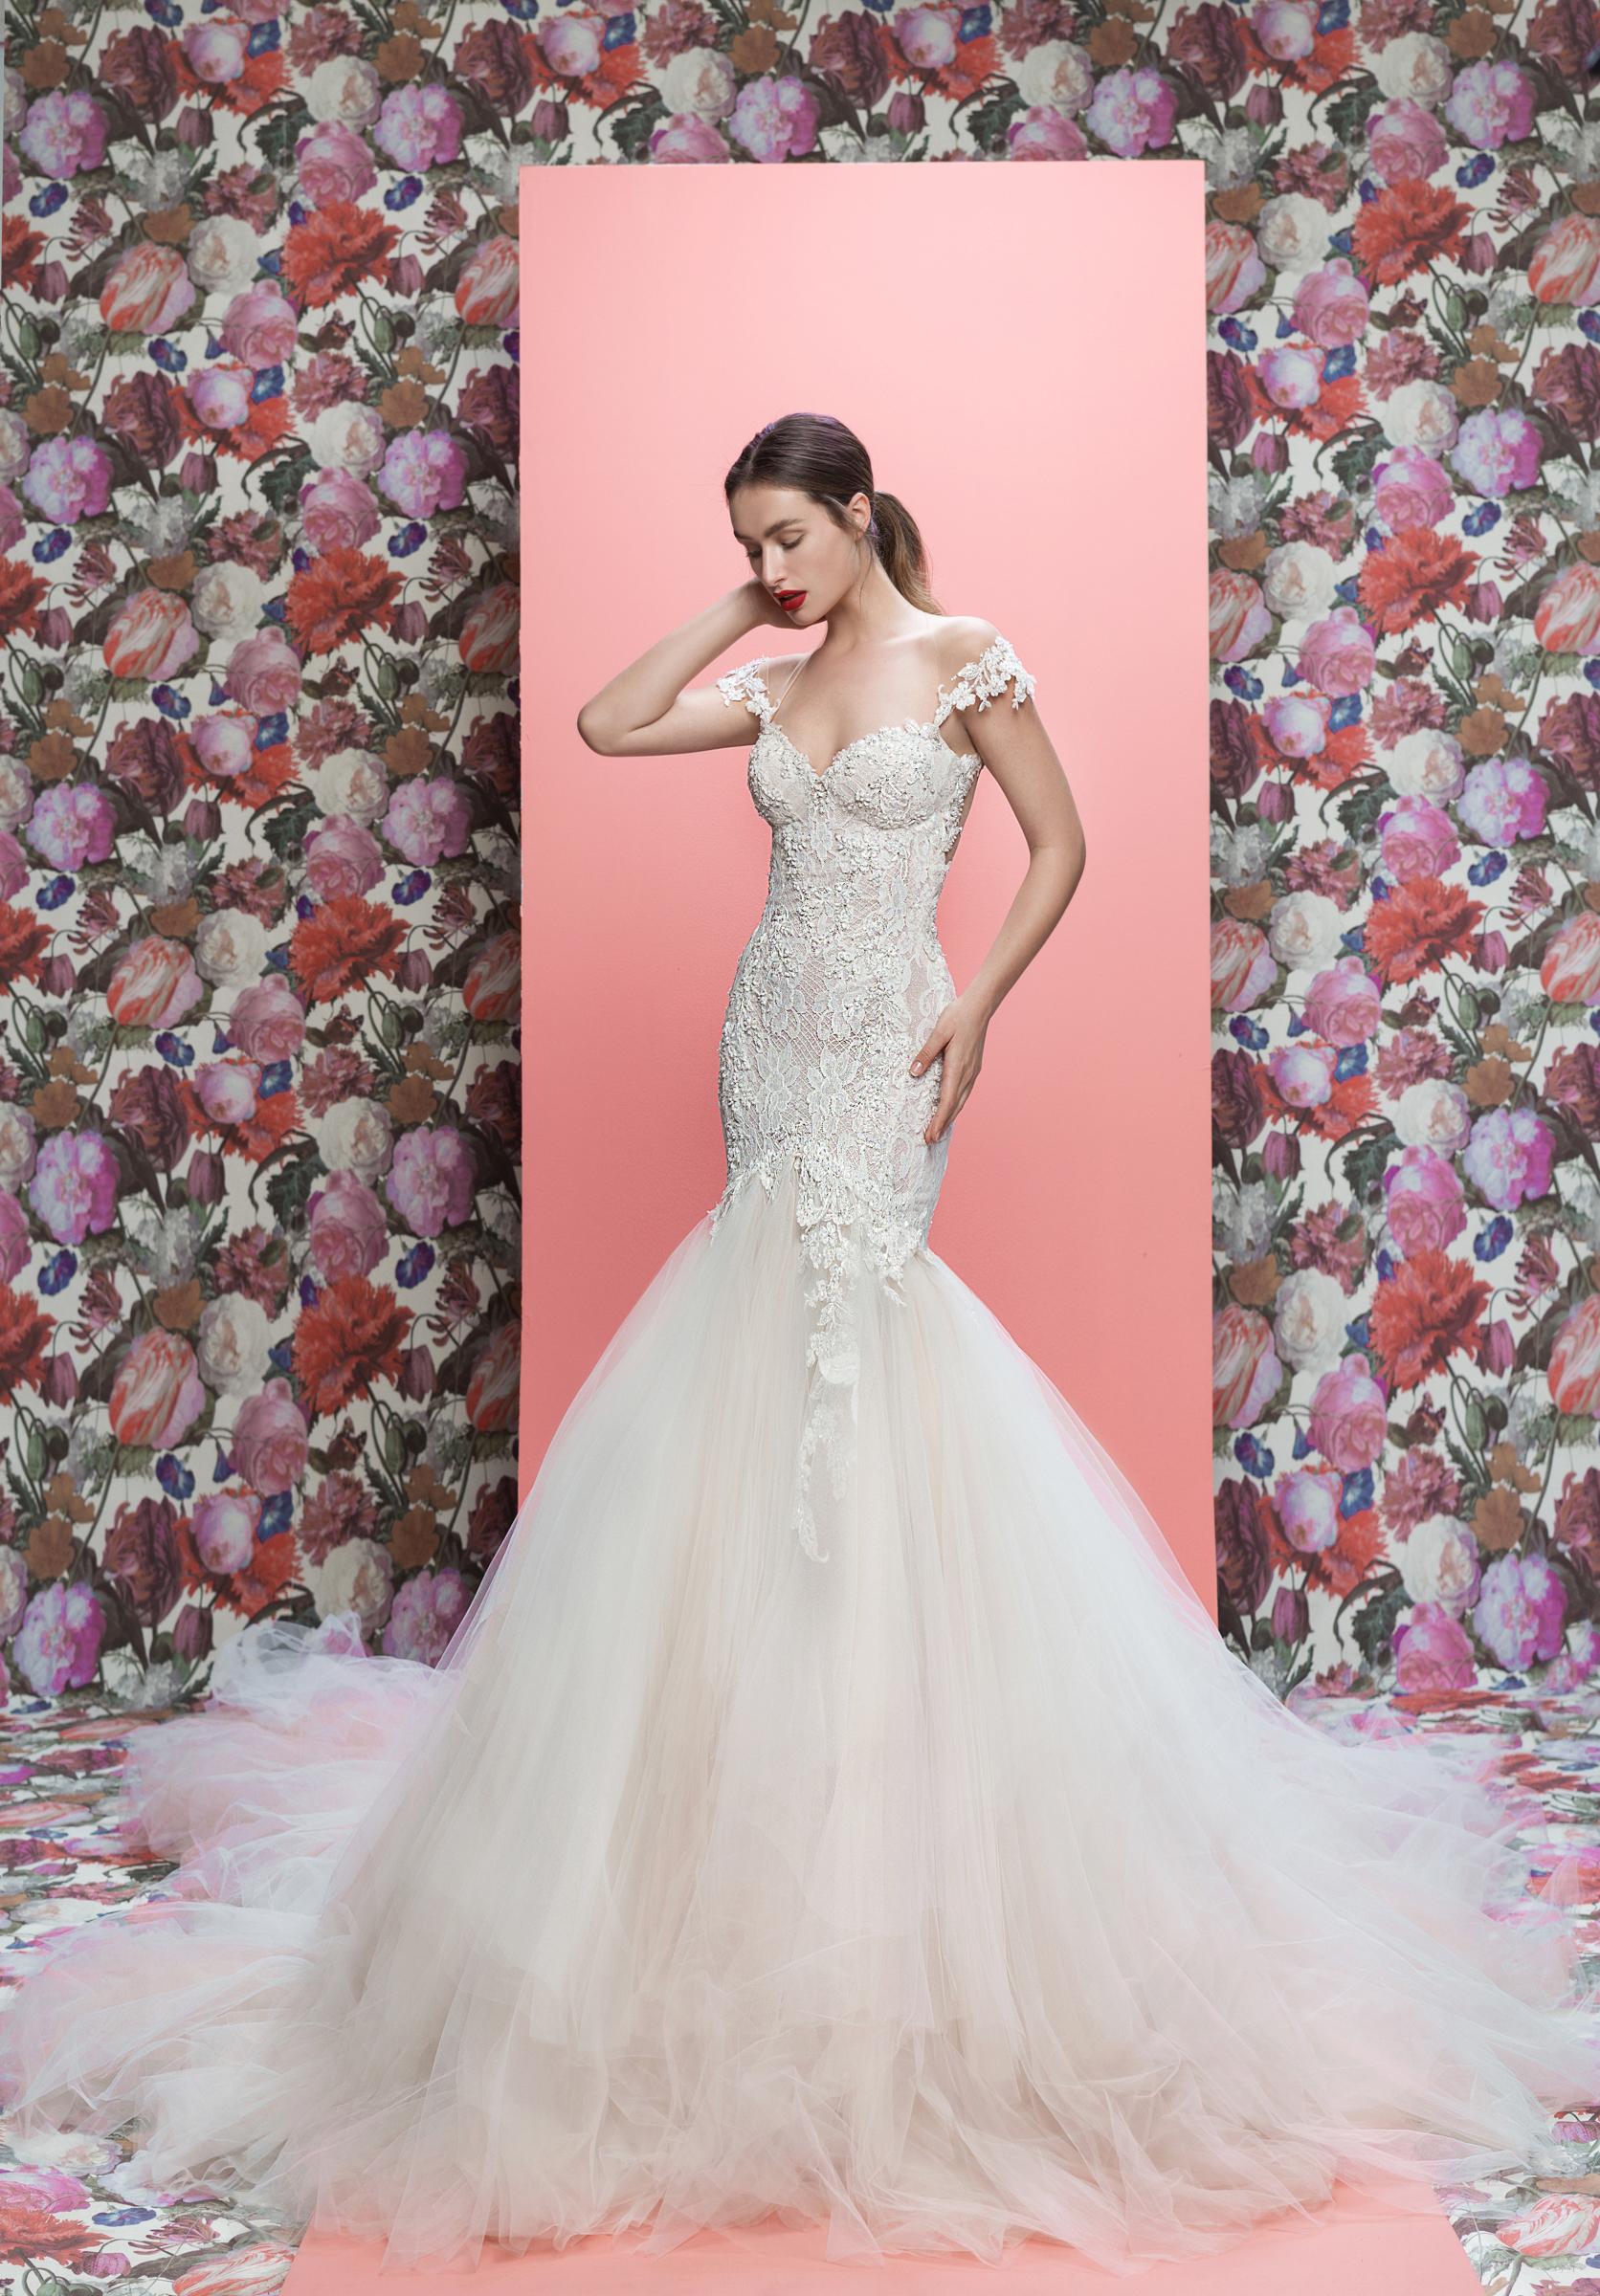 Galia Lahav wedding dress spring 2019 lace off-the-shoulder trumpet